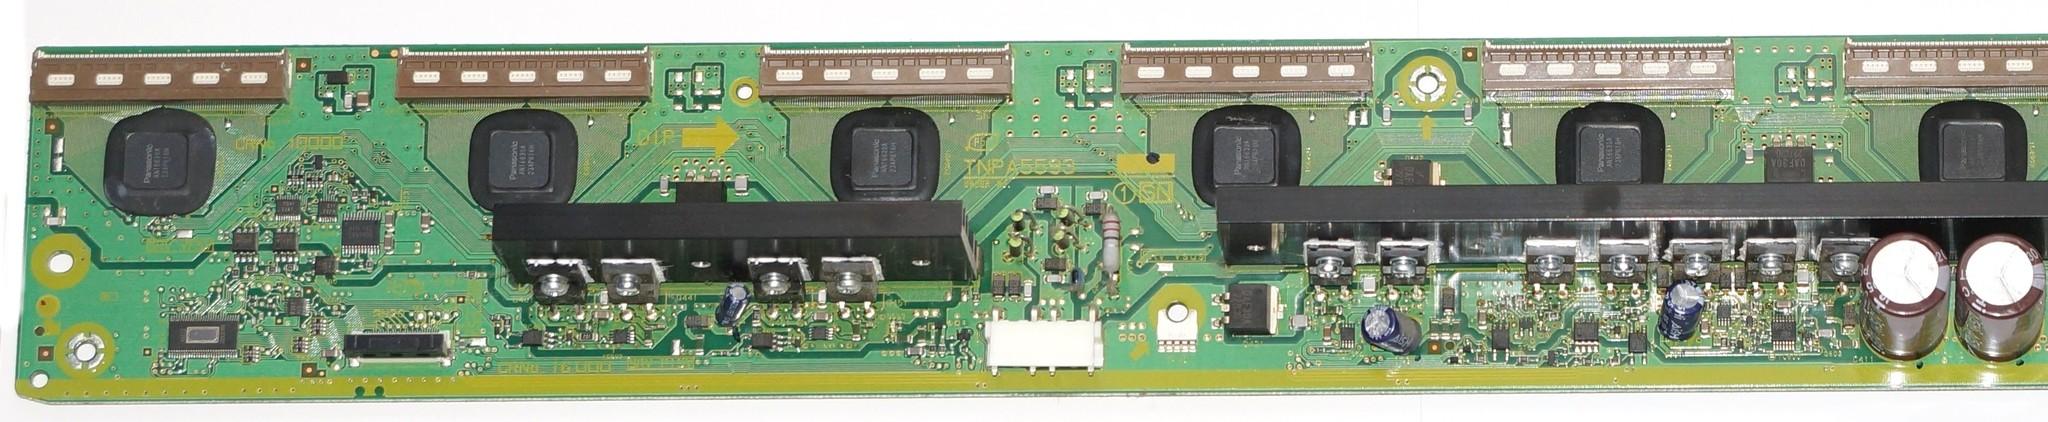 TNPA5593 Y-Sus телевизора Panasonic